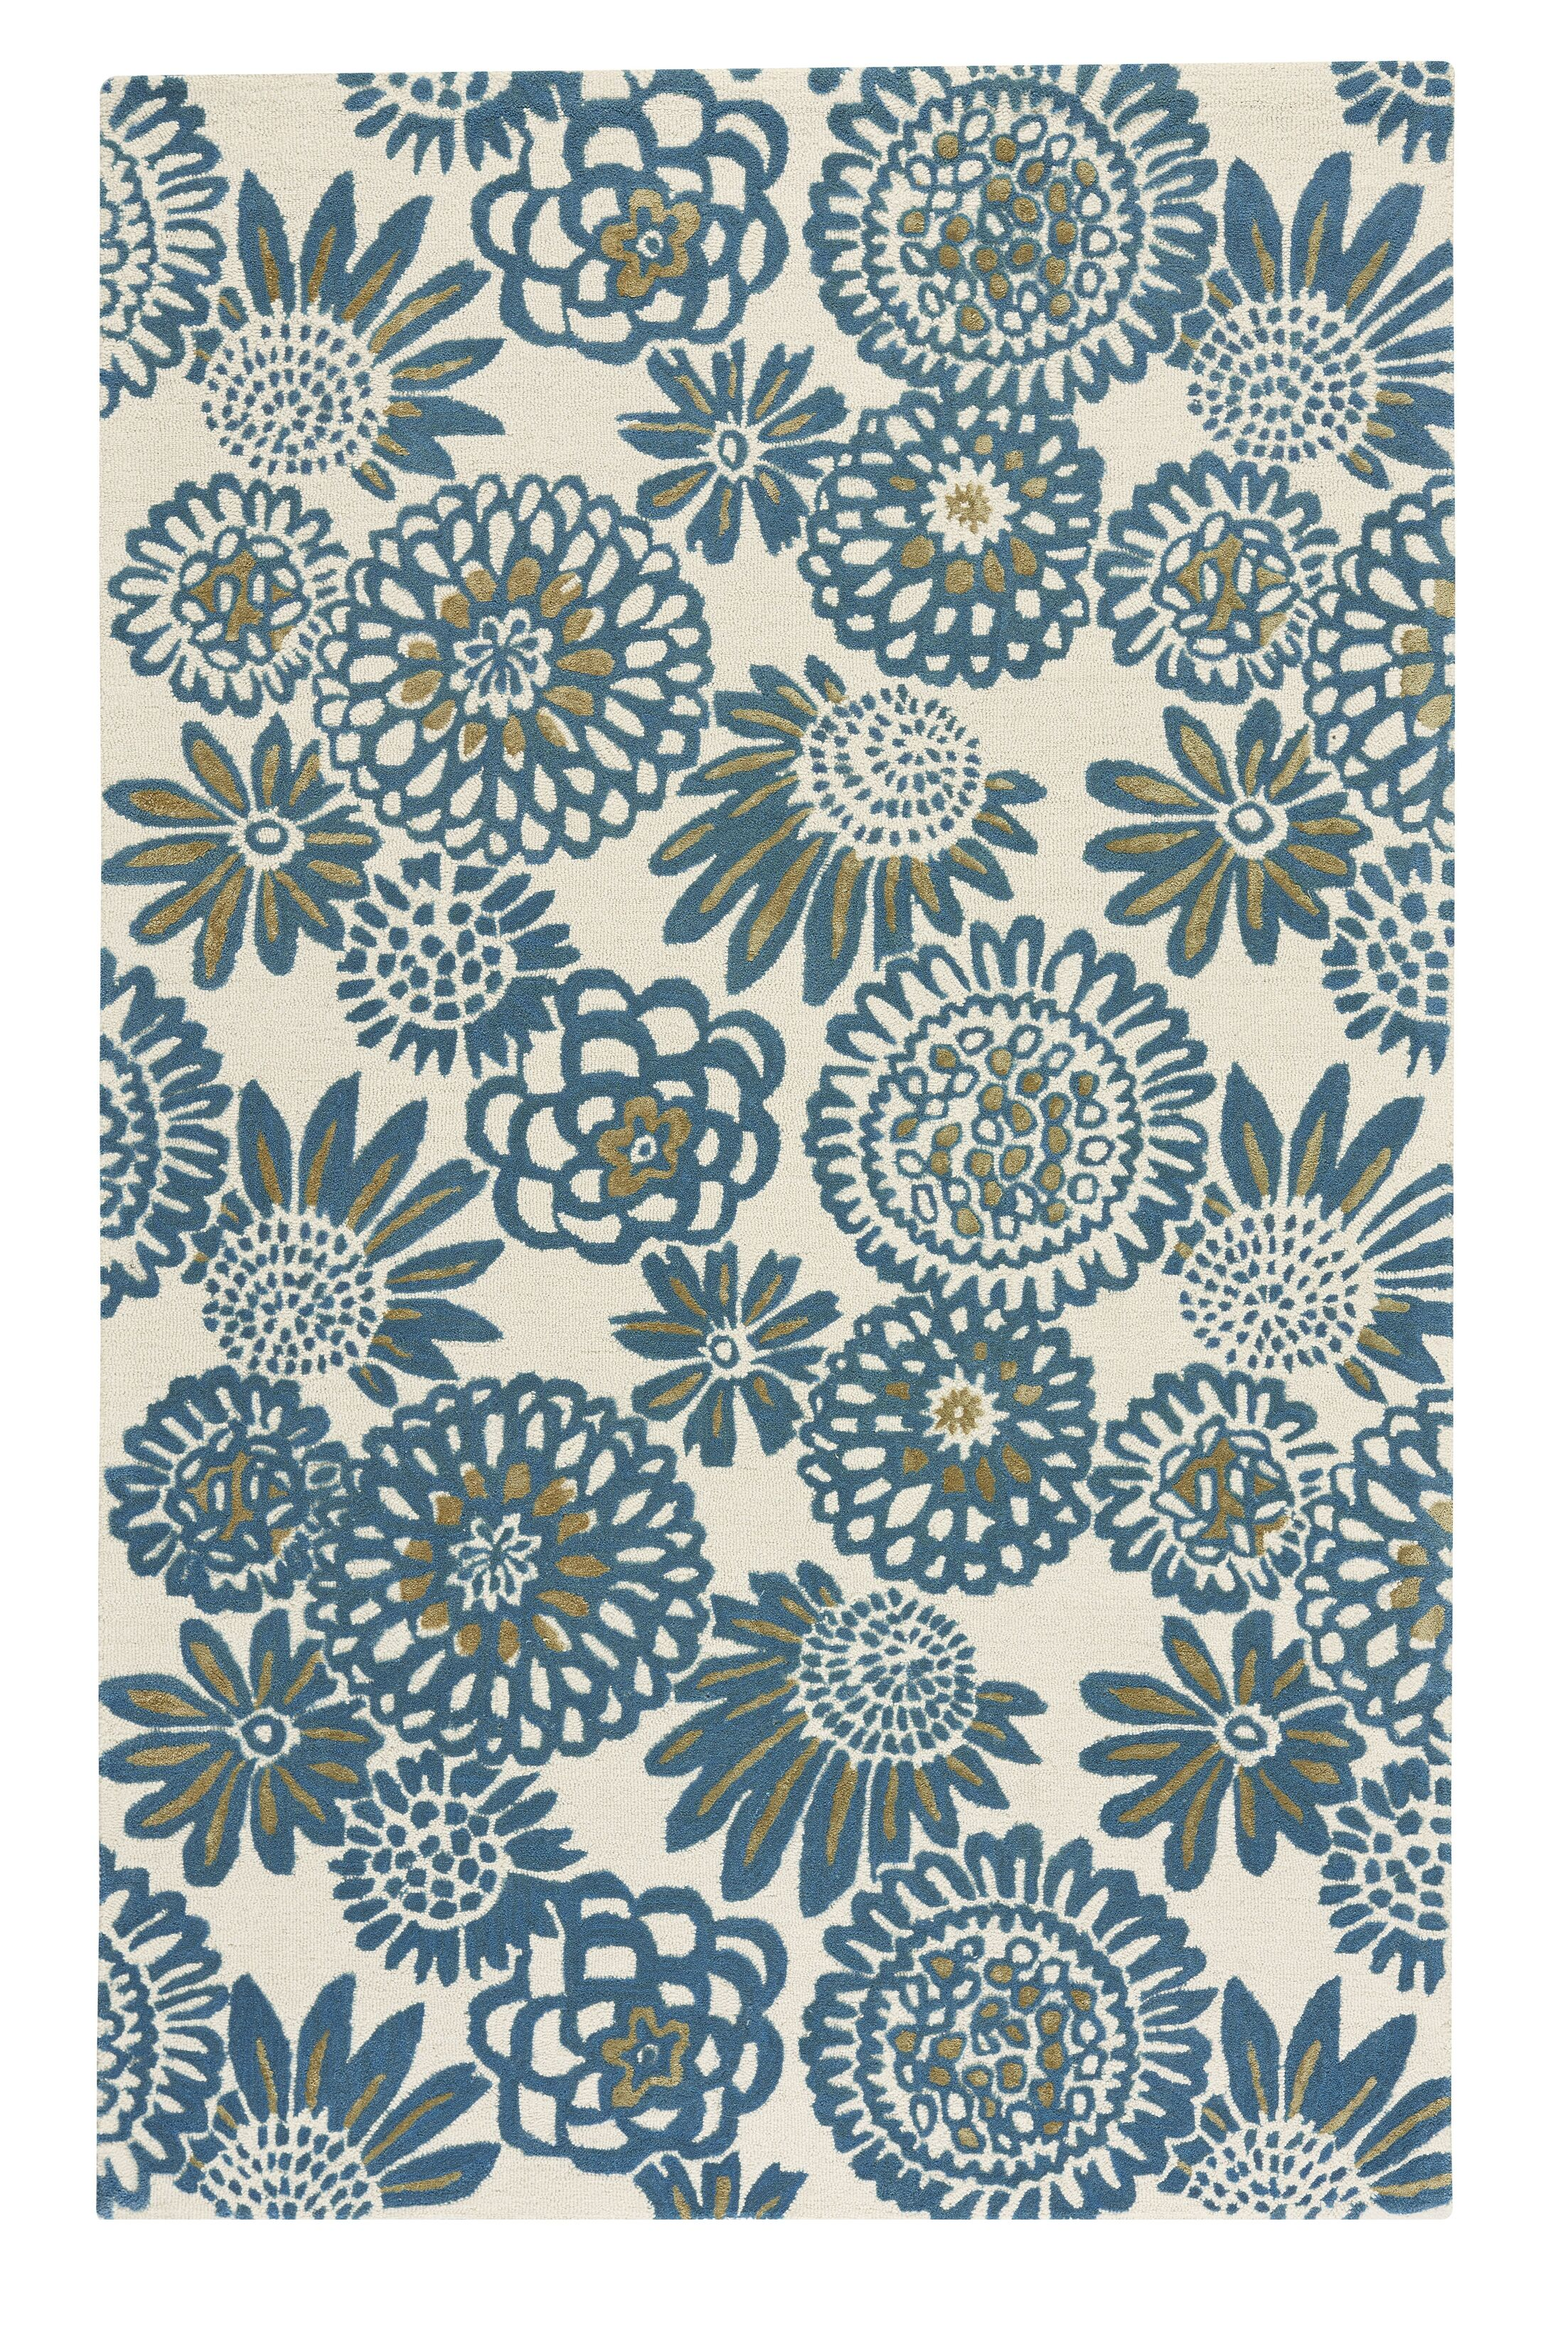 Melzig Genevieve Gorder Pompon Hand-Tufted Blue Area Rug Rug Size: Rectangle 8' x 10'